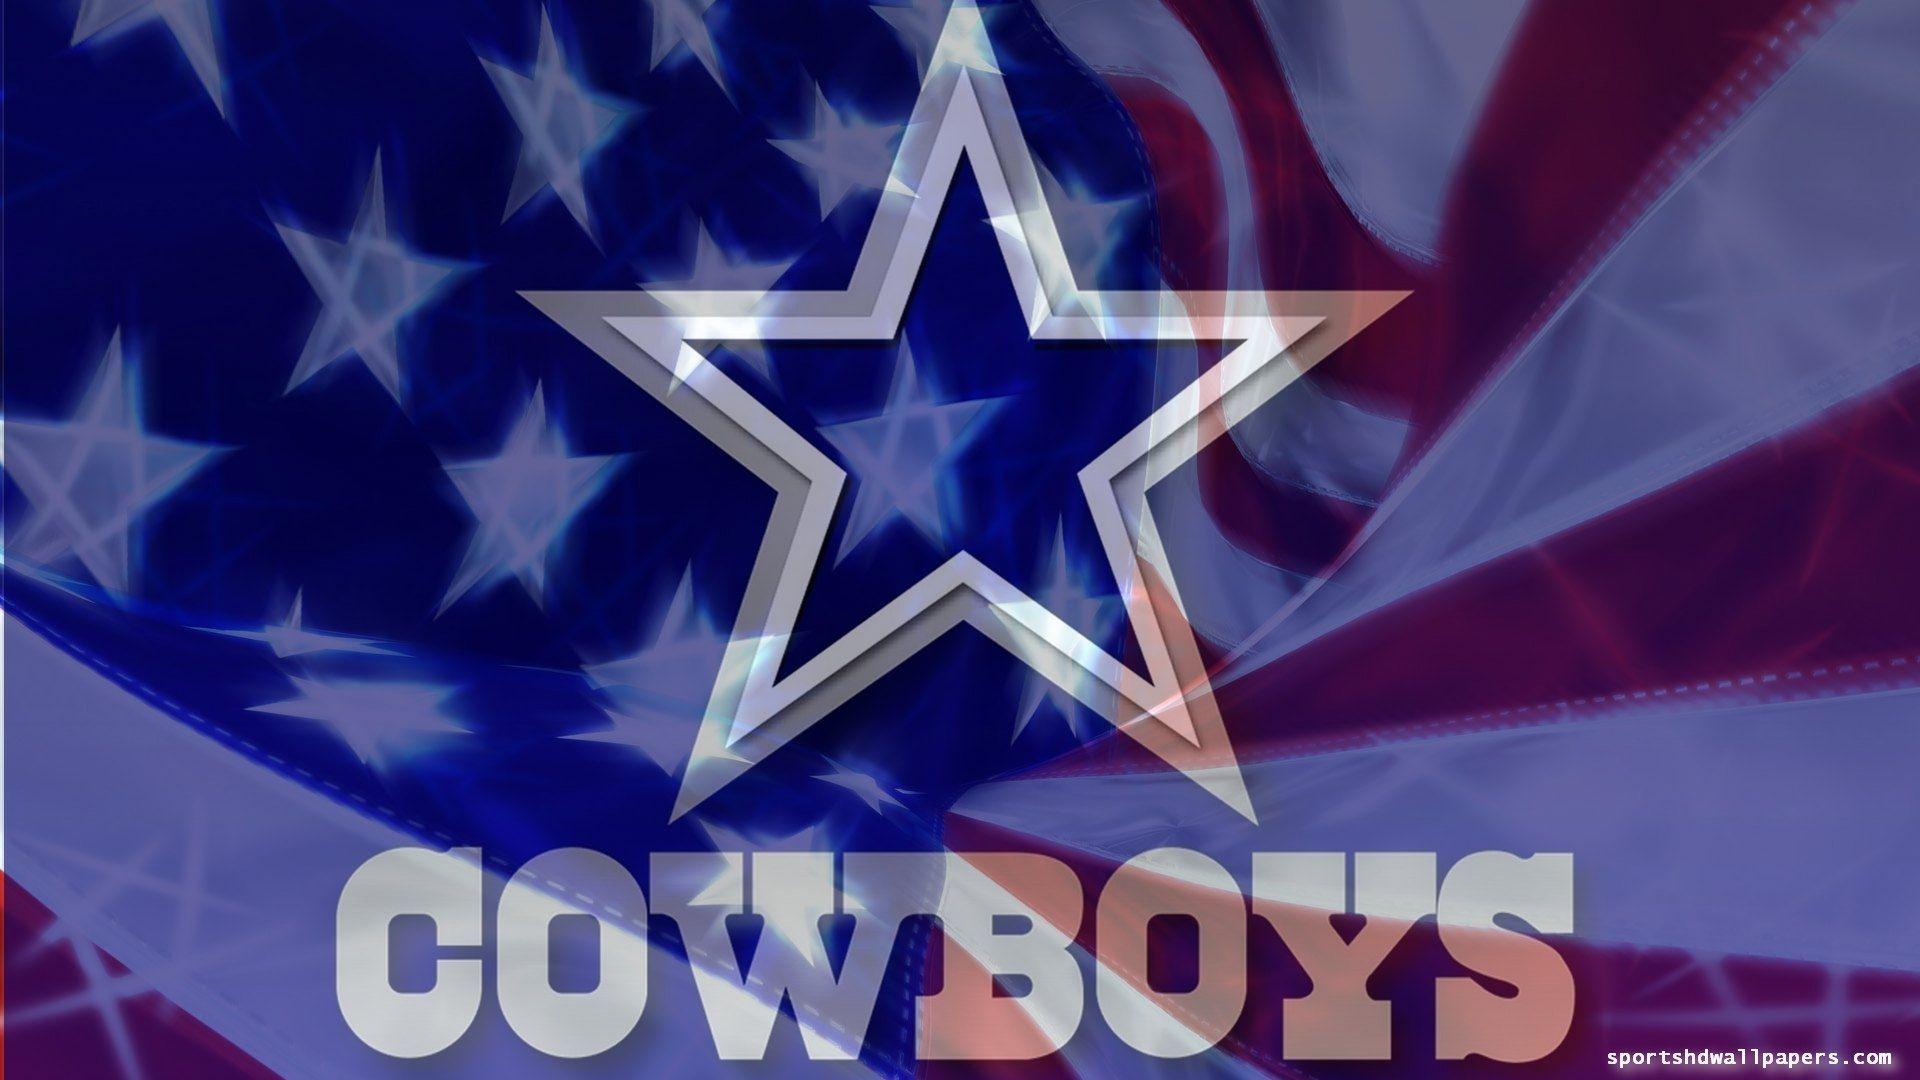 Dallas Cowboys Wallpaper Hd Wallpapers Dallas Cowboys Desktop Wallpaper Nfl L Dallas Cowboys Wallpaper Dallas Cowboys Logo Dallas Cowboys Football Wallpapers